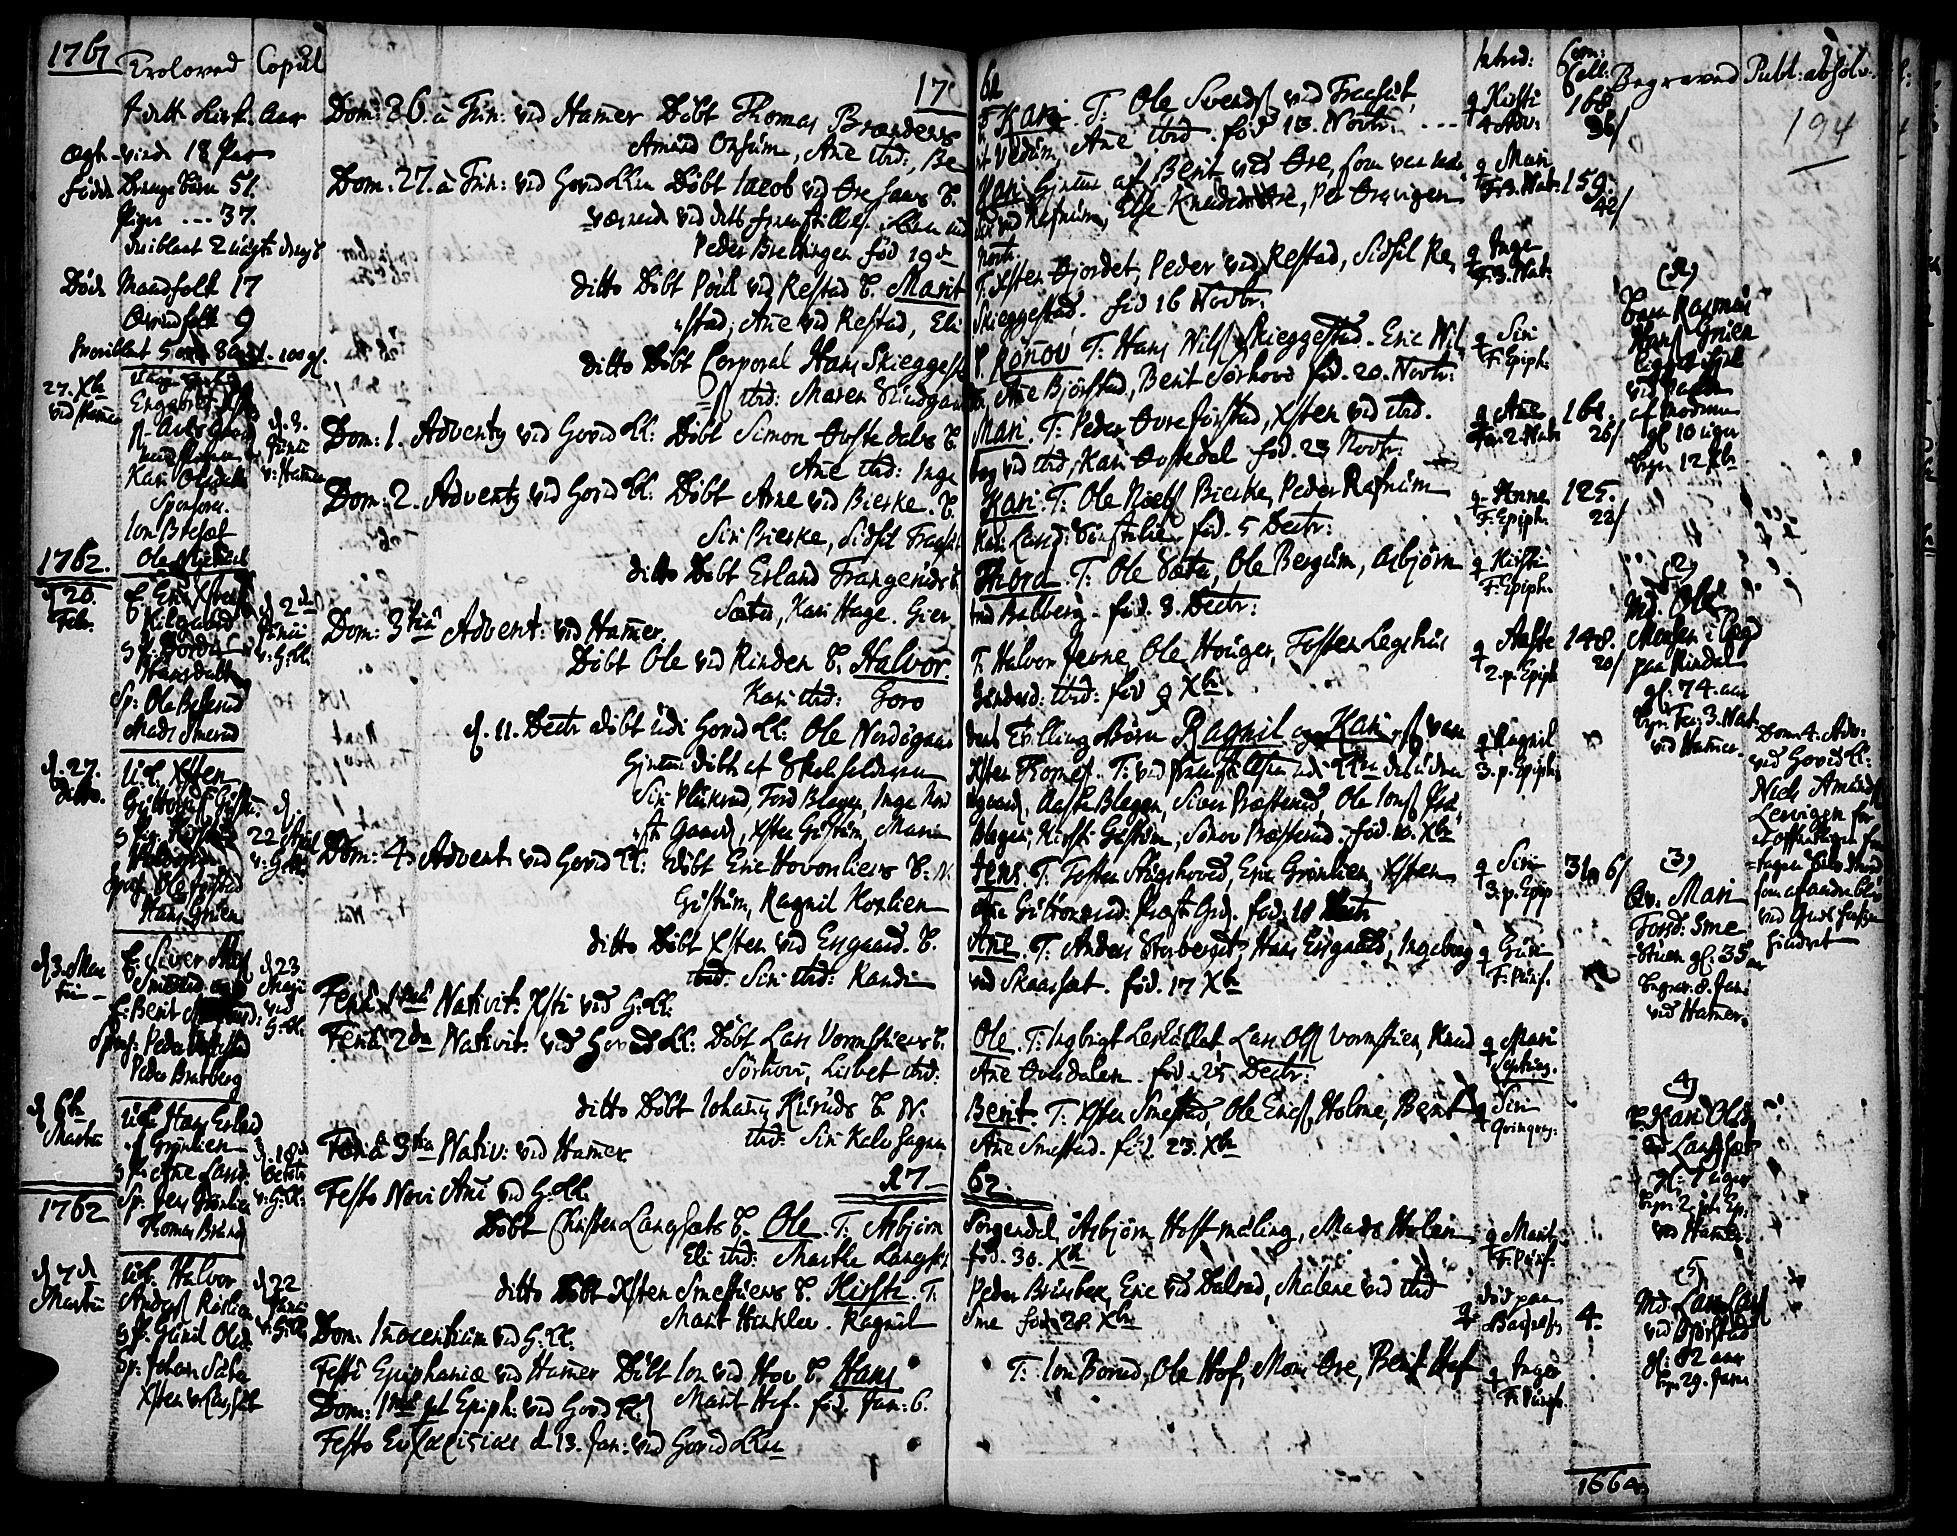 SAH, Fåberg prestekontor, Ministerialbok nr. 1, 1727-1775, s. 194